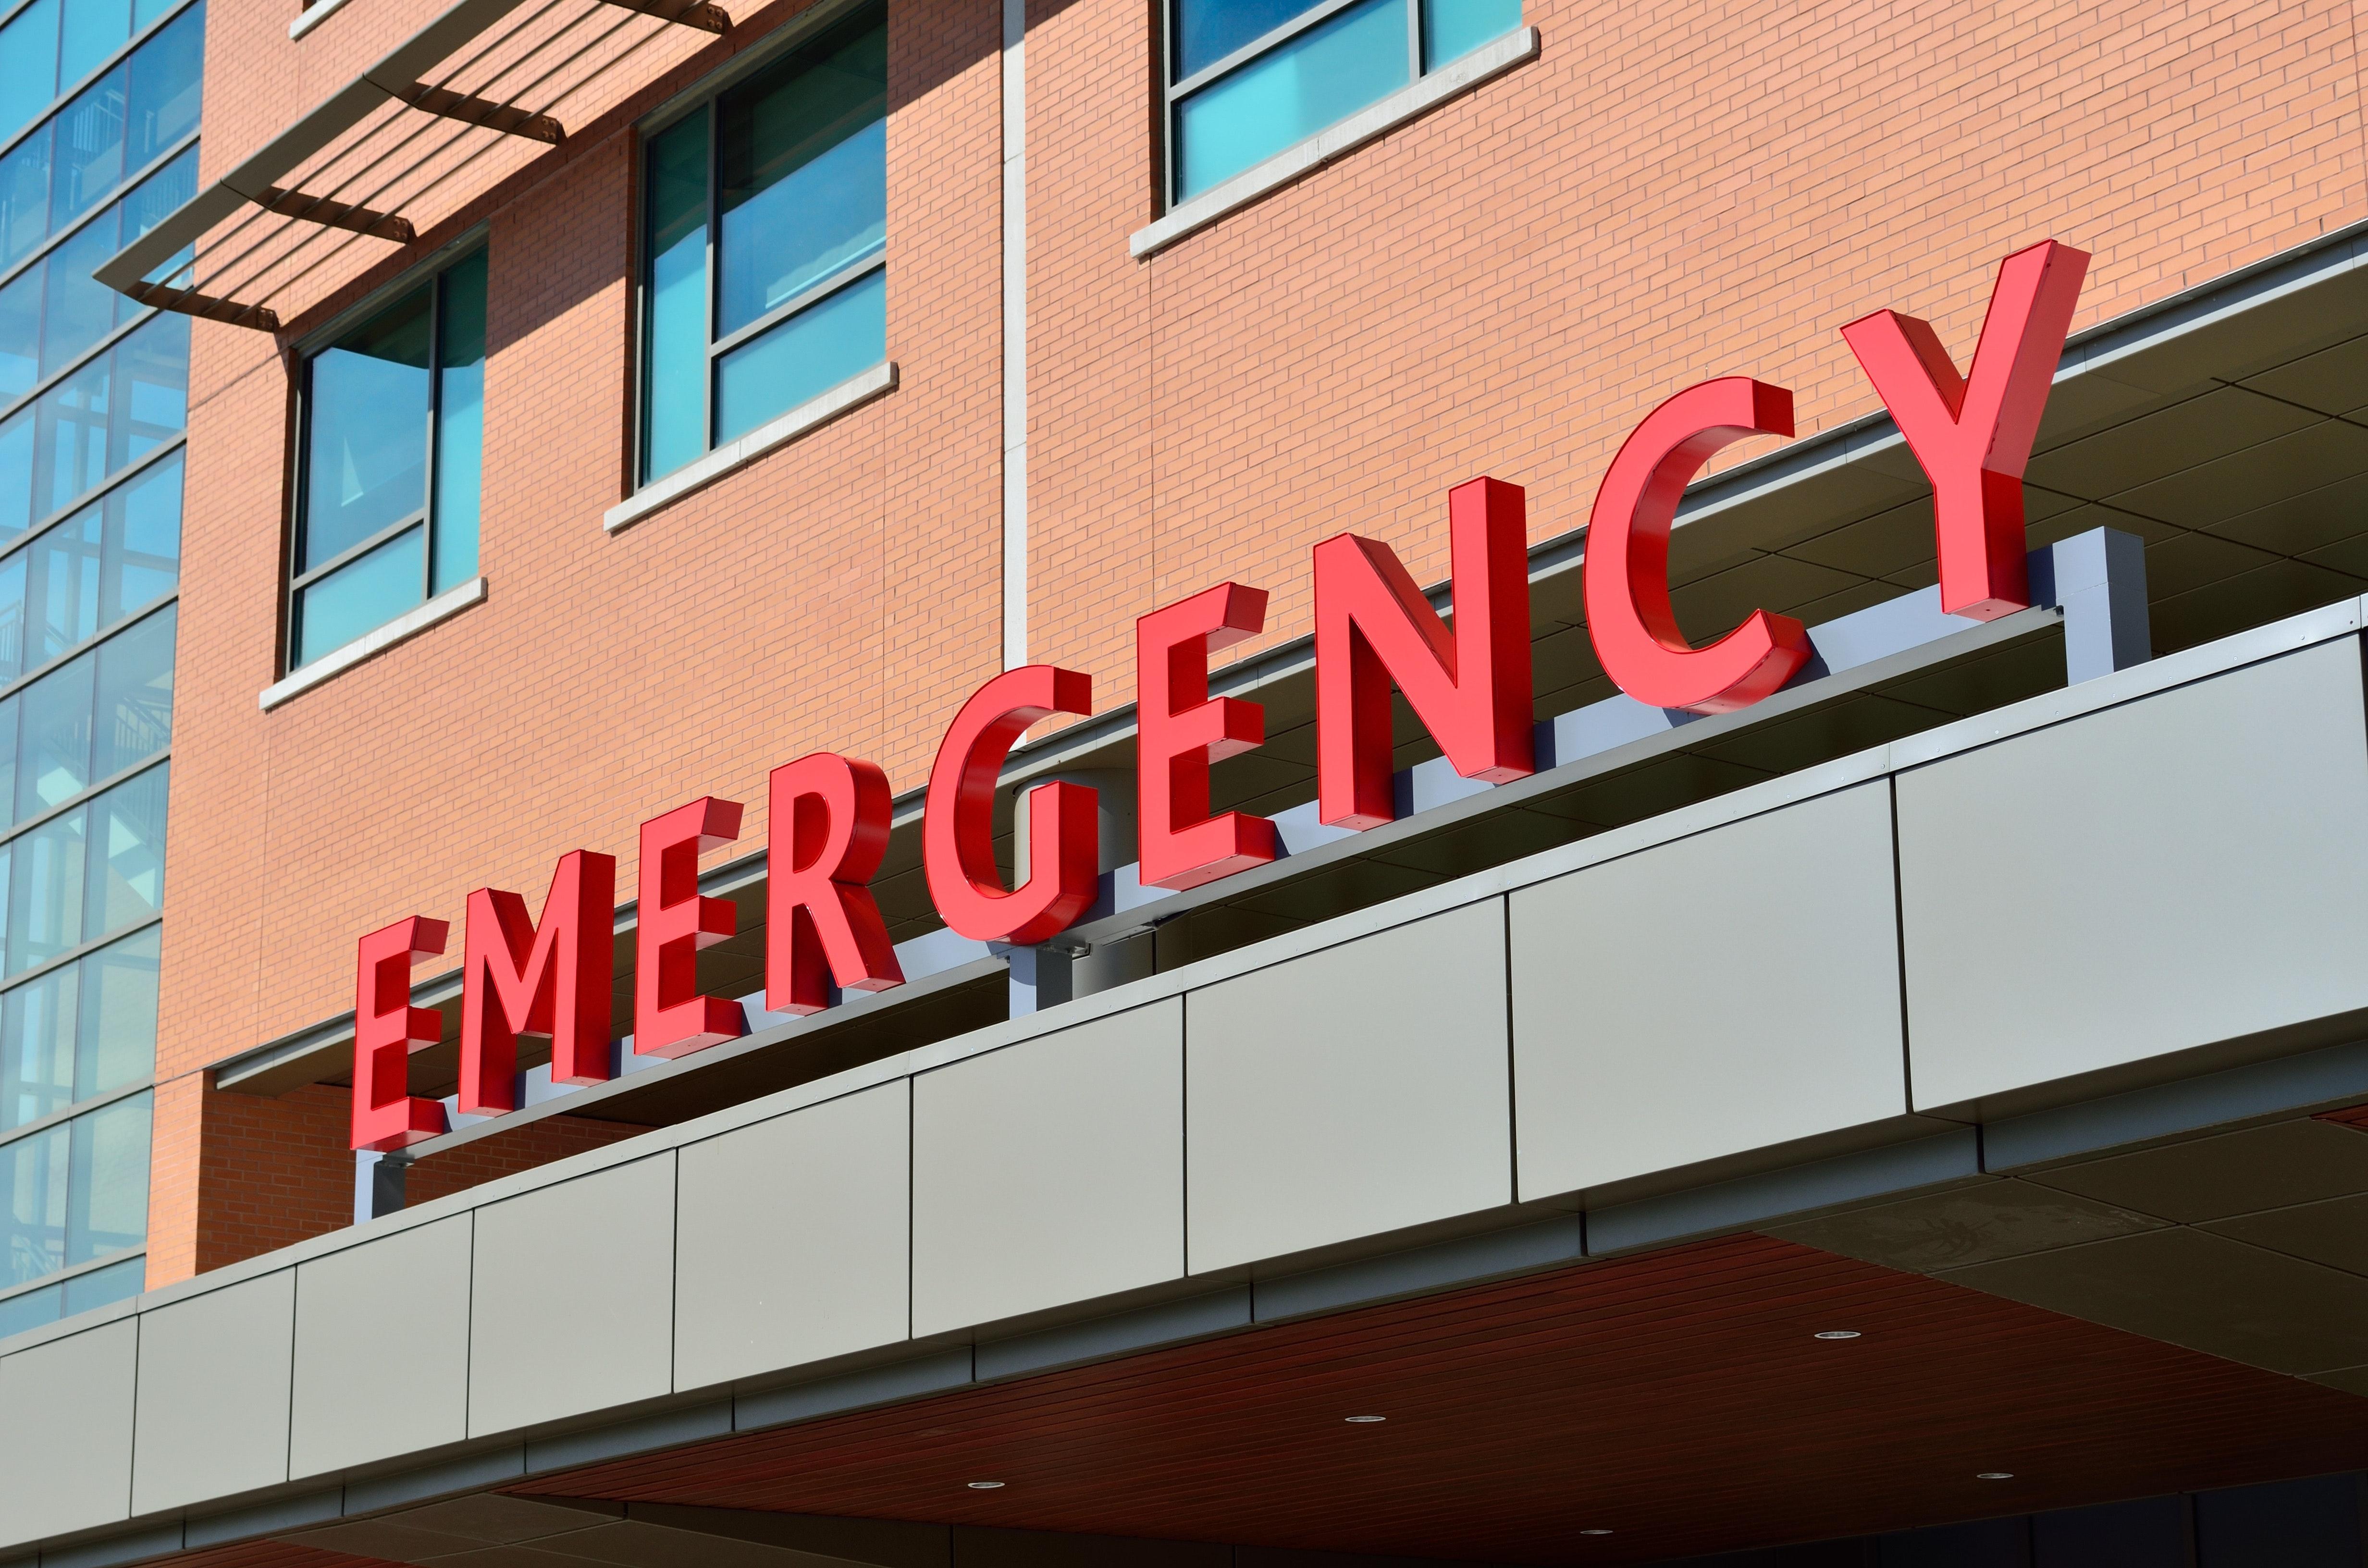 Emergency sign outside of hospital